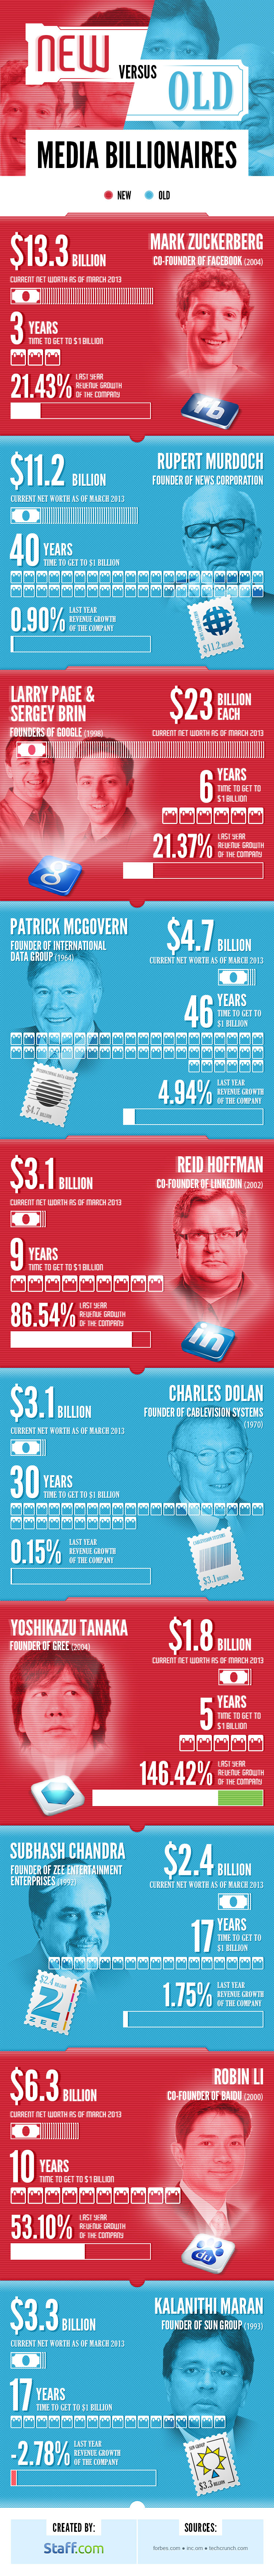 New vs Old Media Billionaires